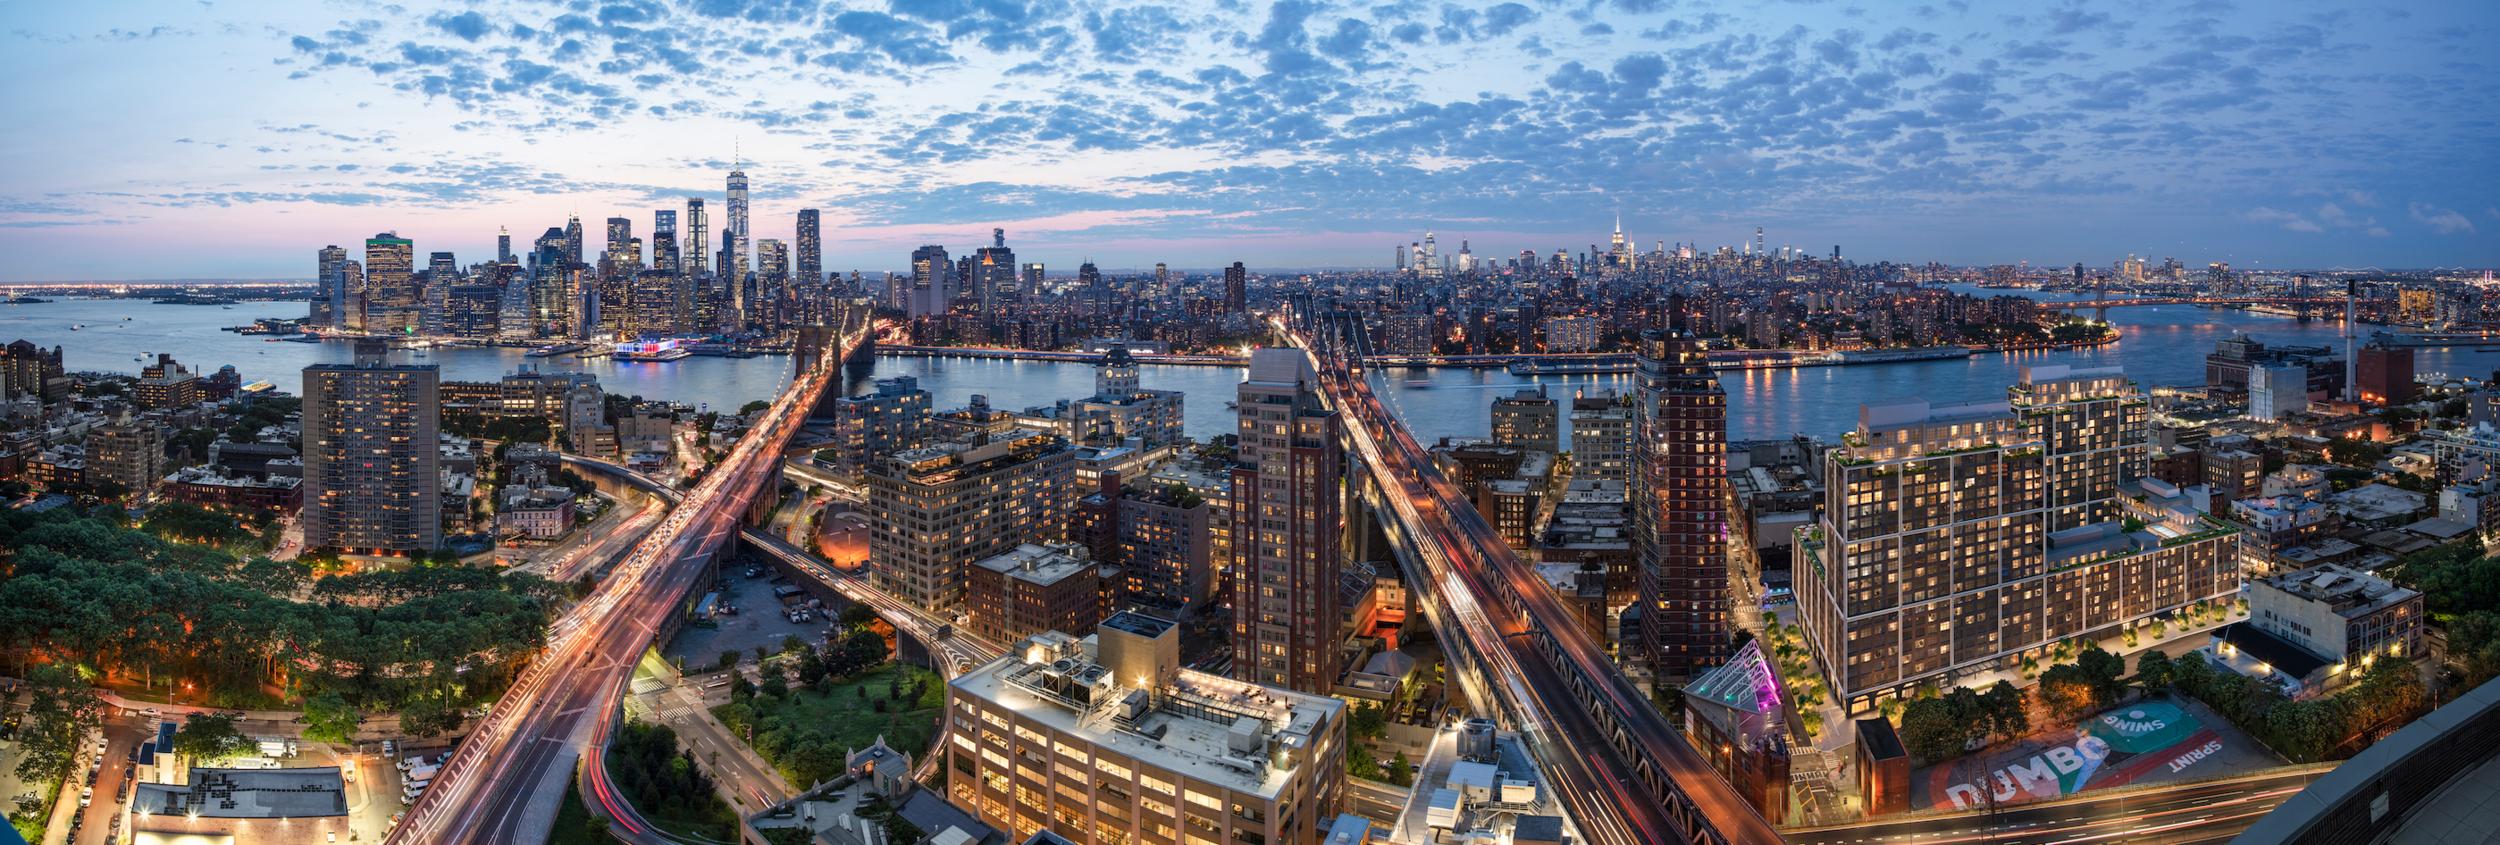 "CIM Group & LIVWRK Reveal Highly Anticipated Dumbo Development ""Front & York"" At 85 Jay Street"